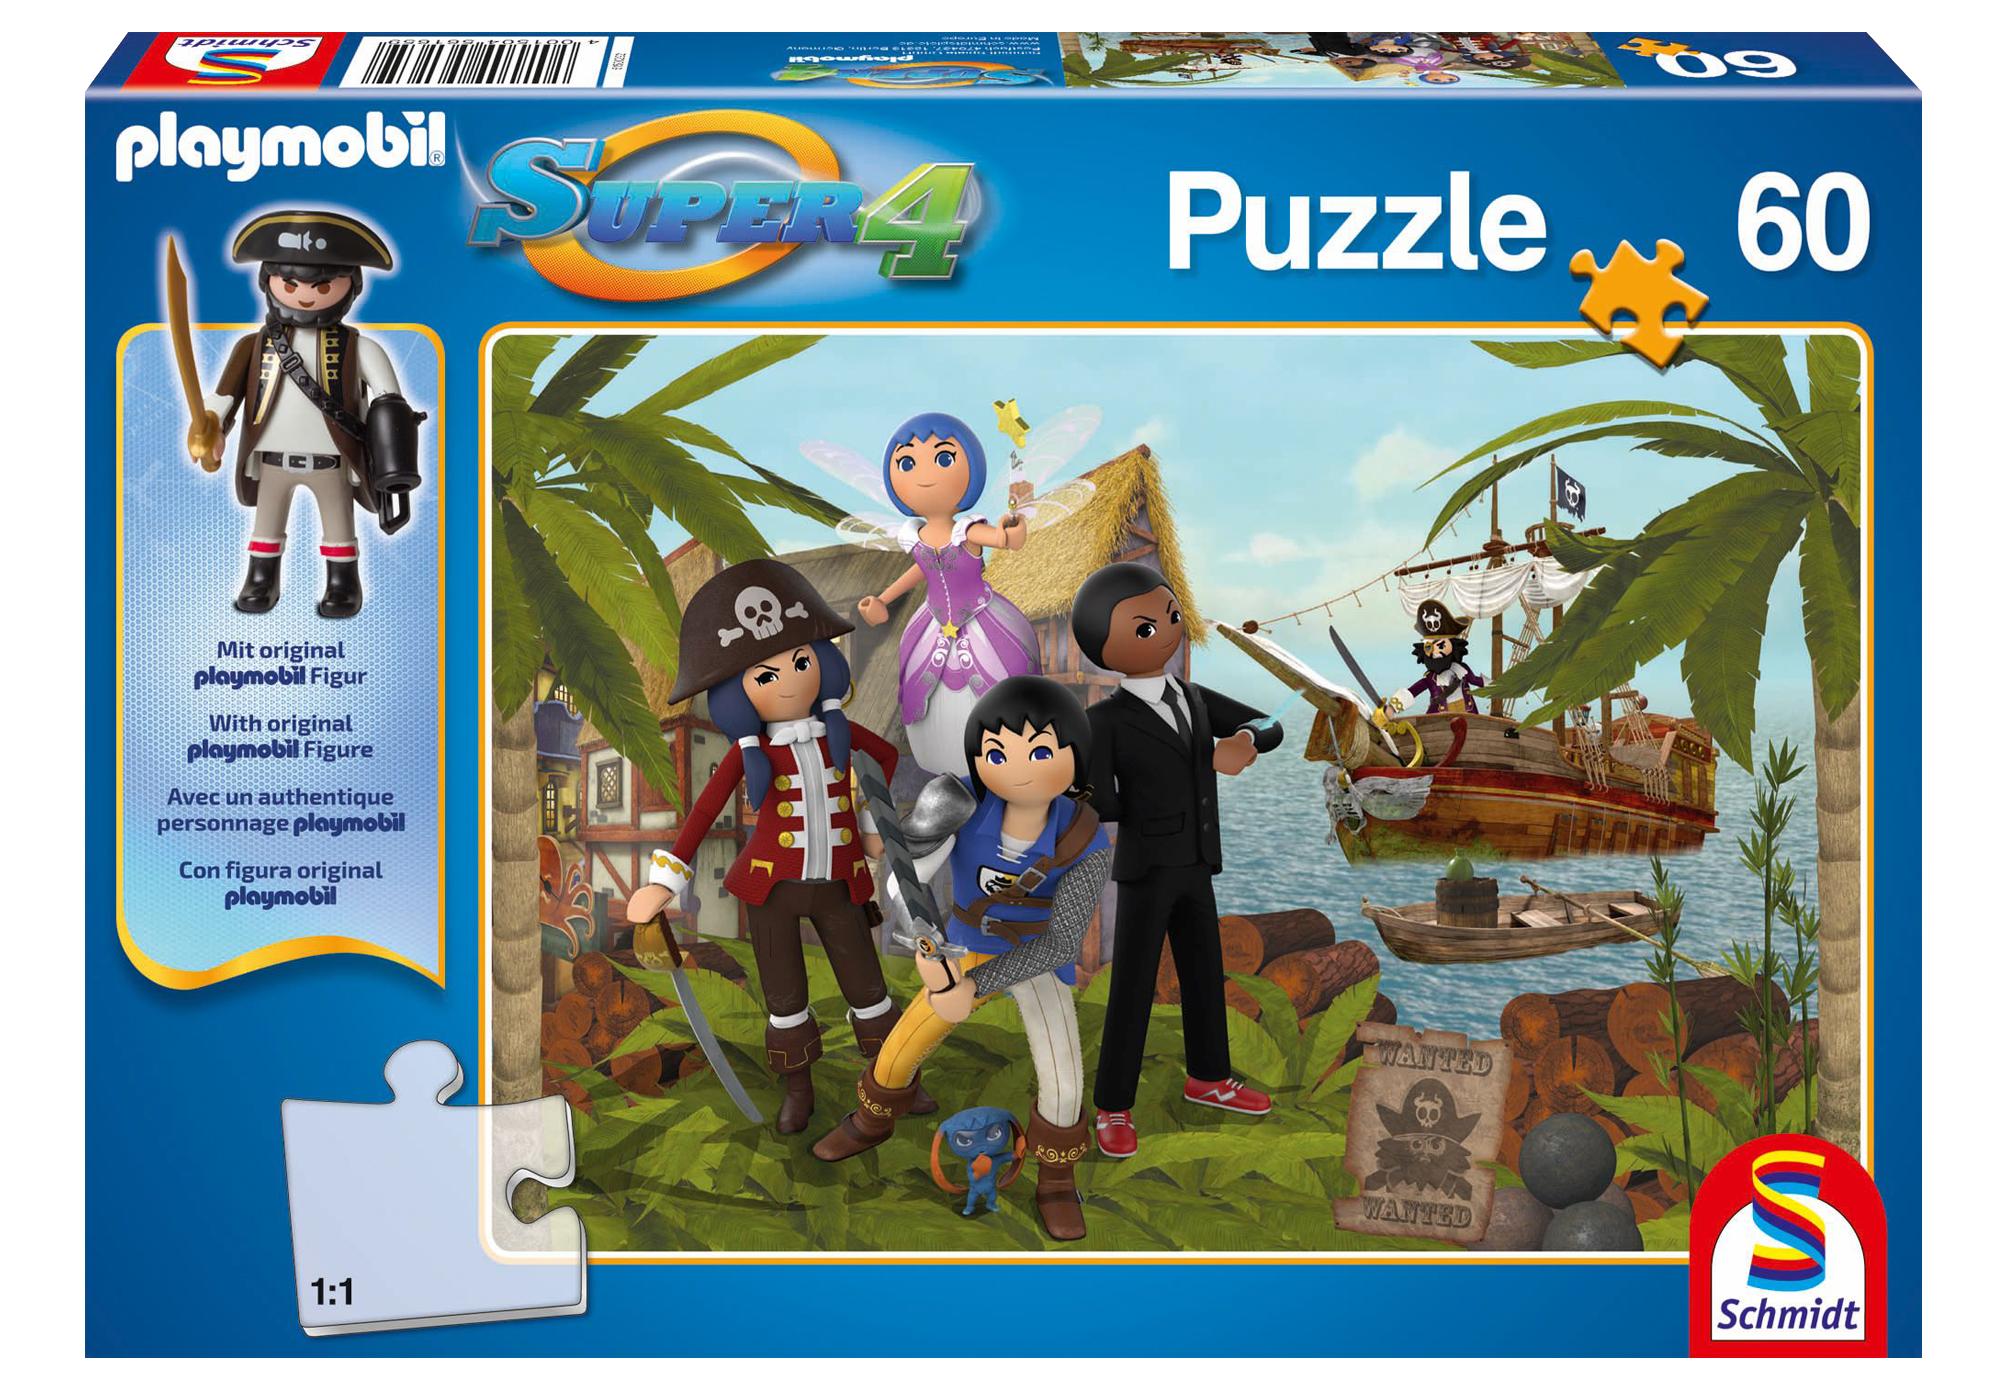 http://media.playmobil.com/i/playmobil/80706_product_detail/Puzzle Super4 - Gunpowder Island